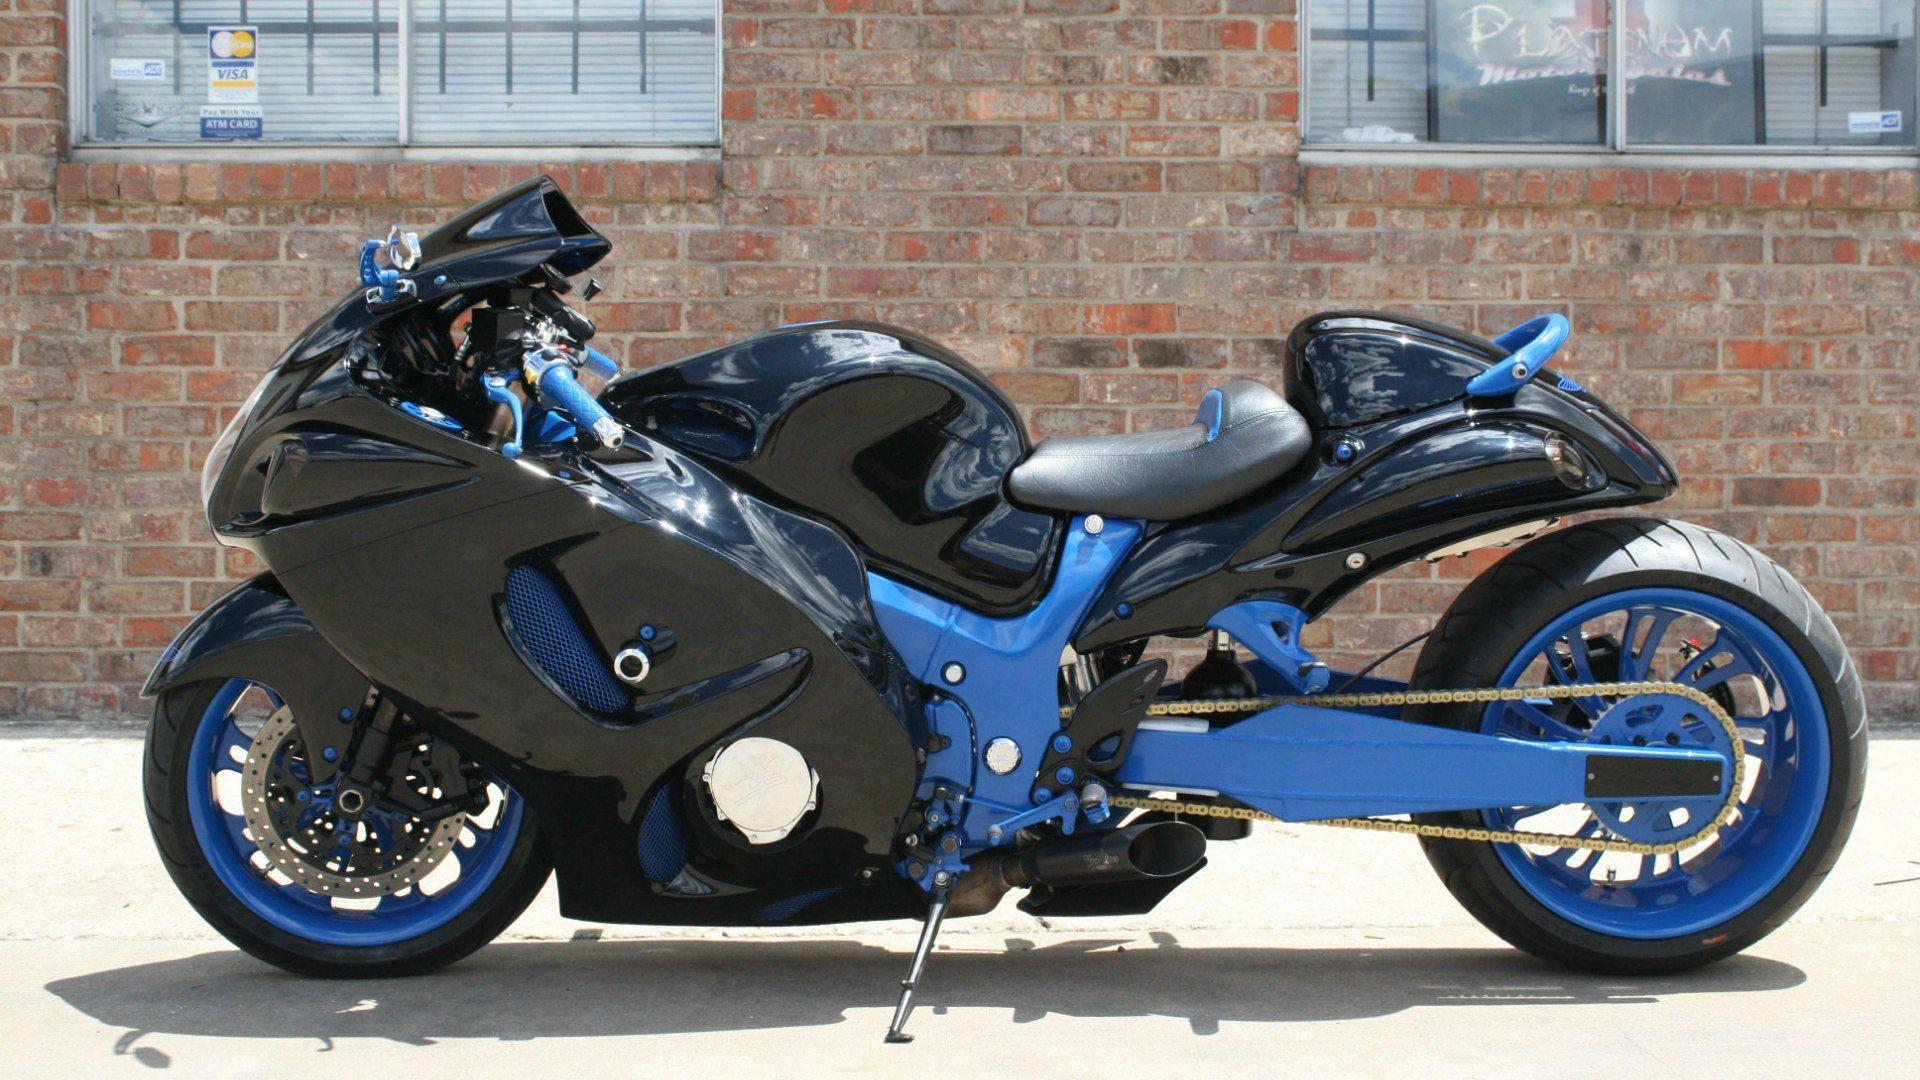 suzuki motocross bike hd - photo #46